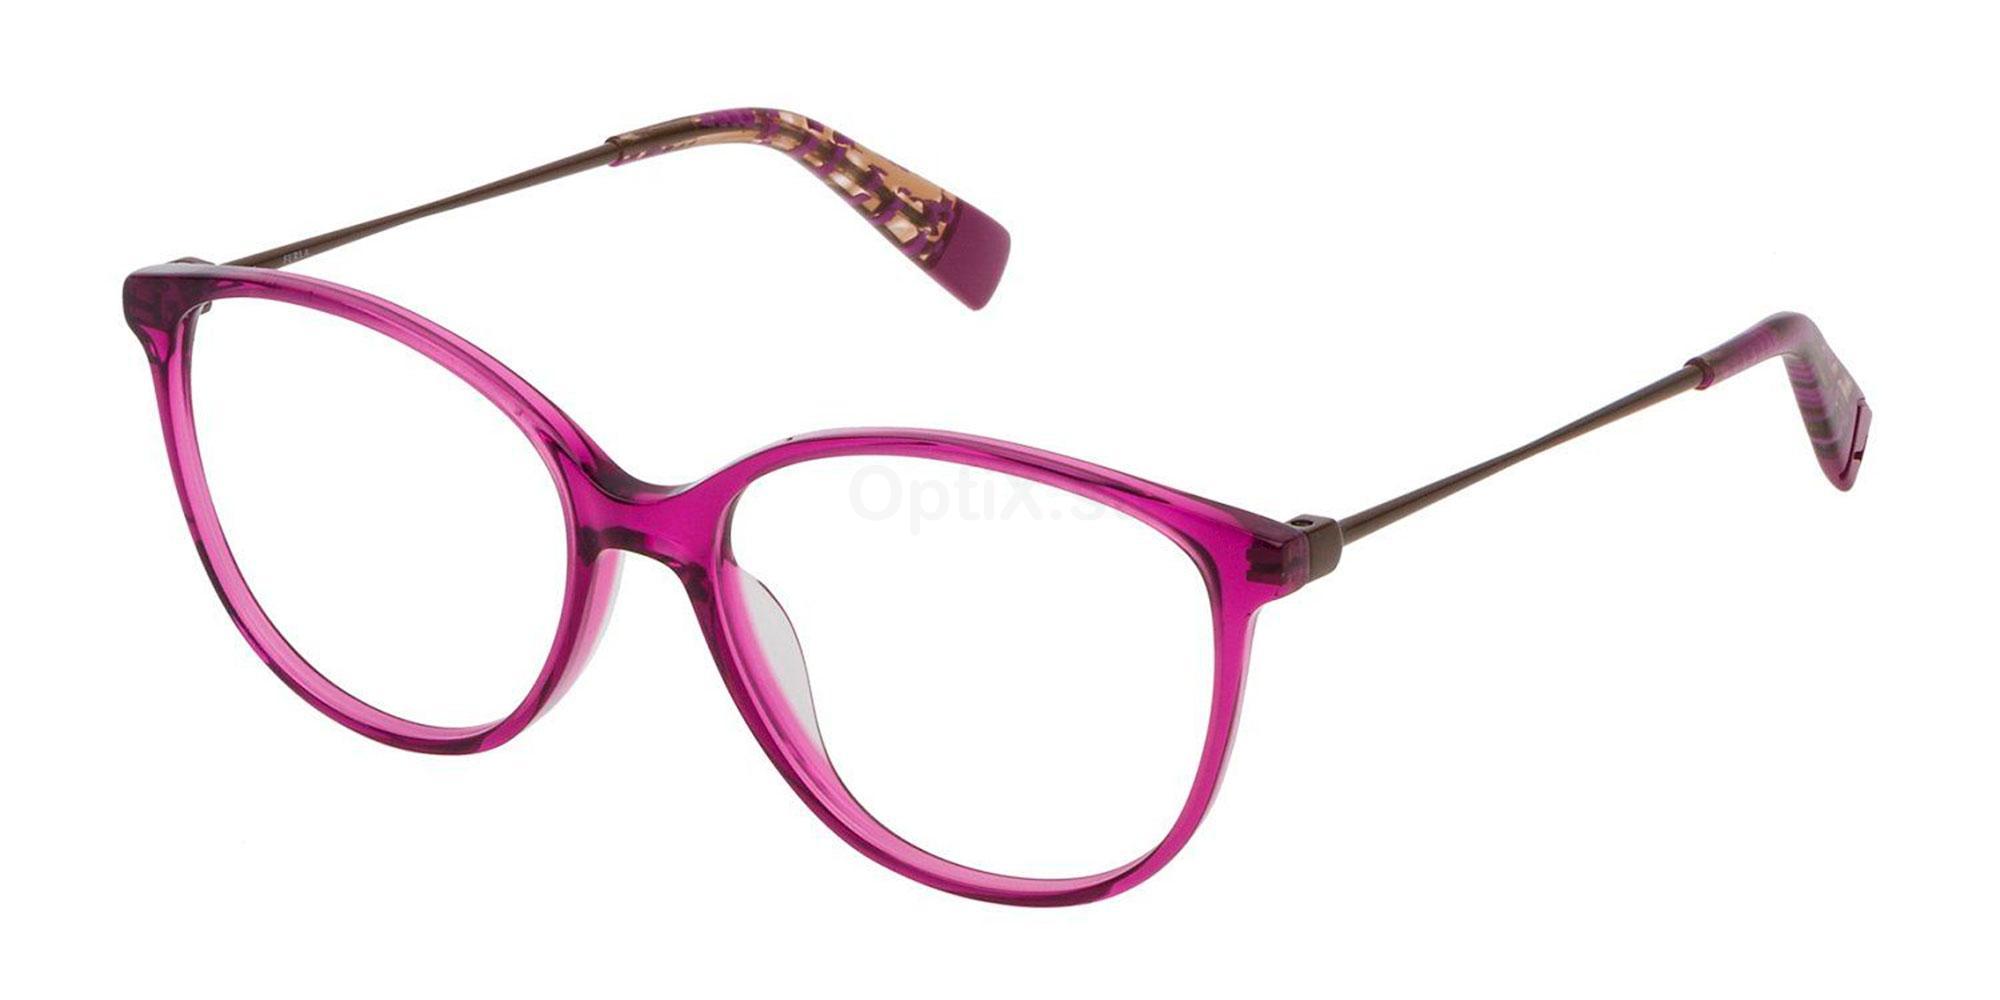 01F5 VFU201 Glasses, Furla